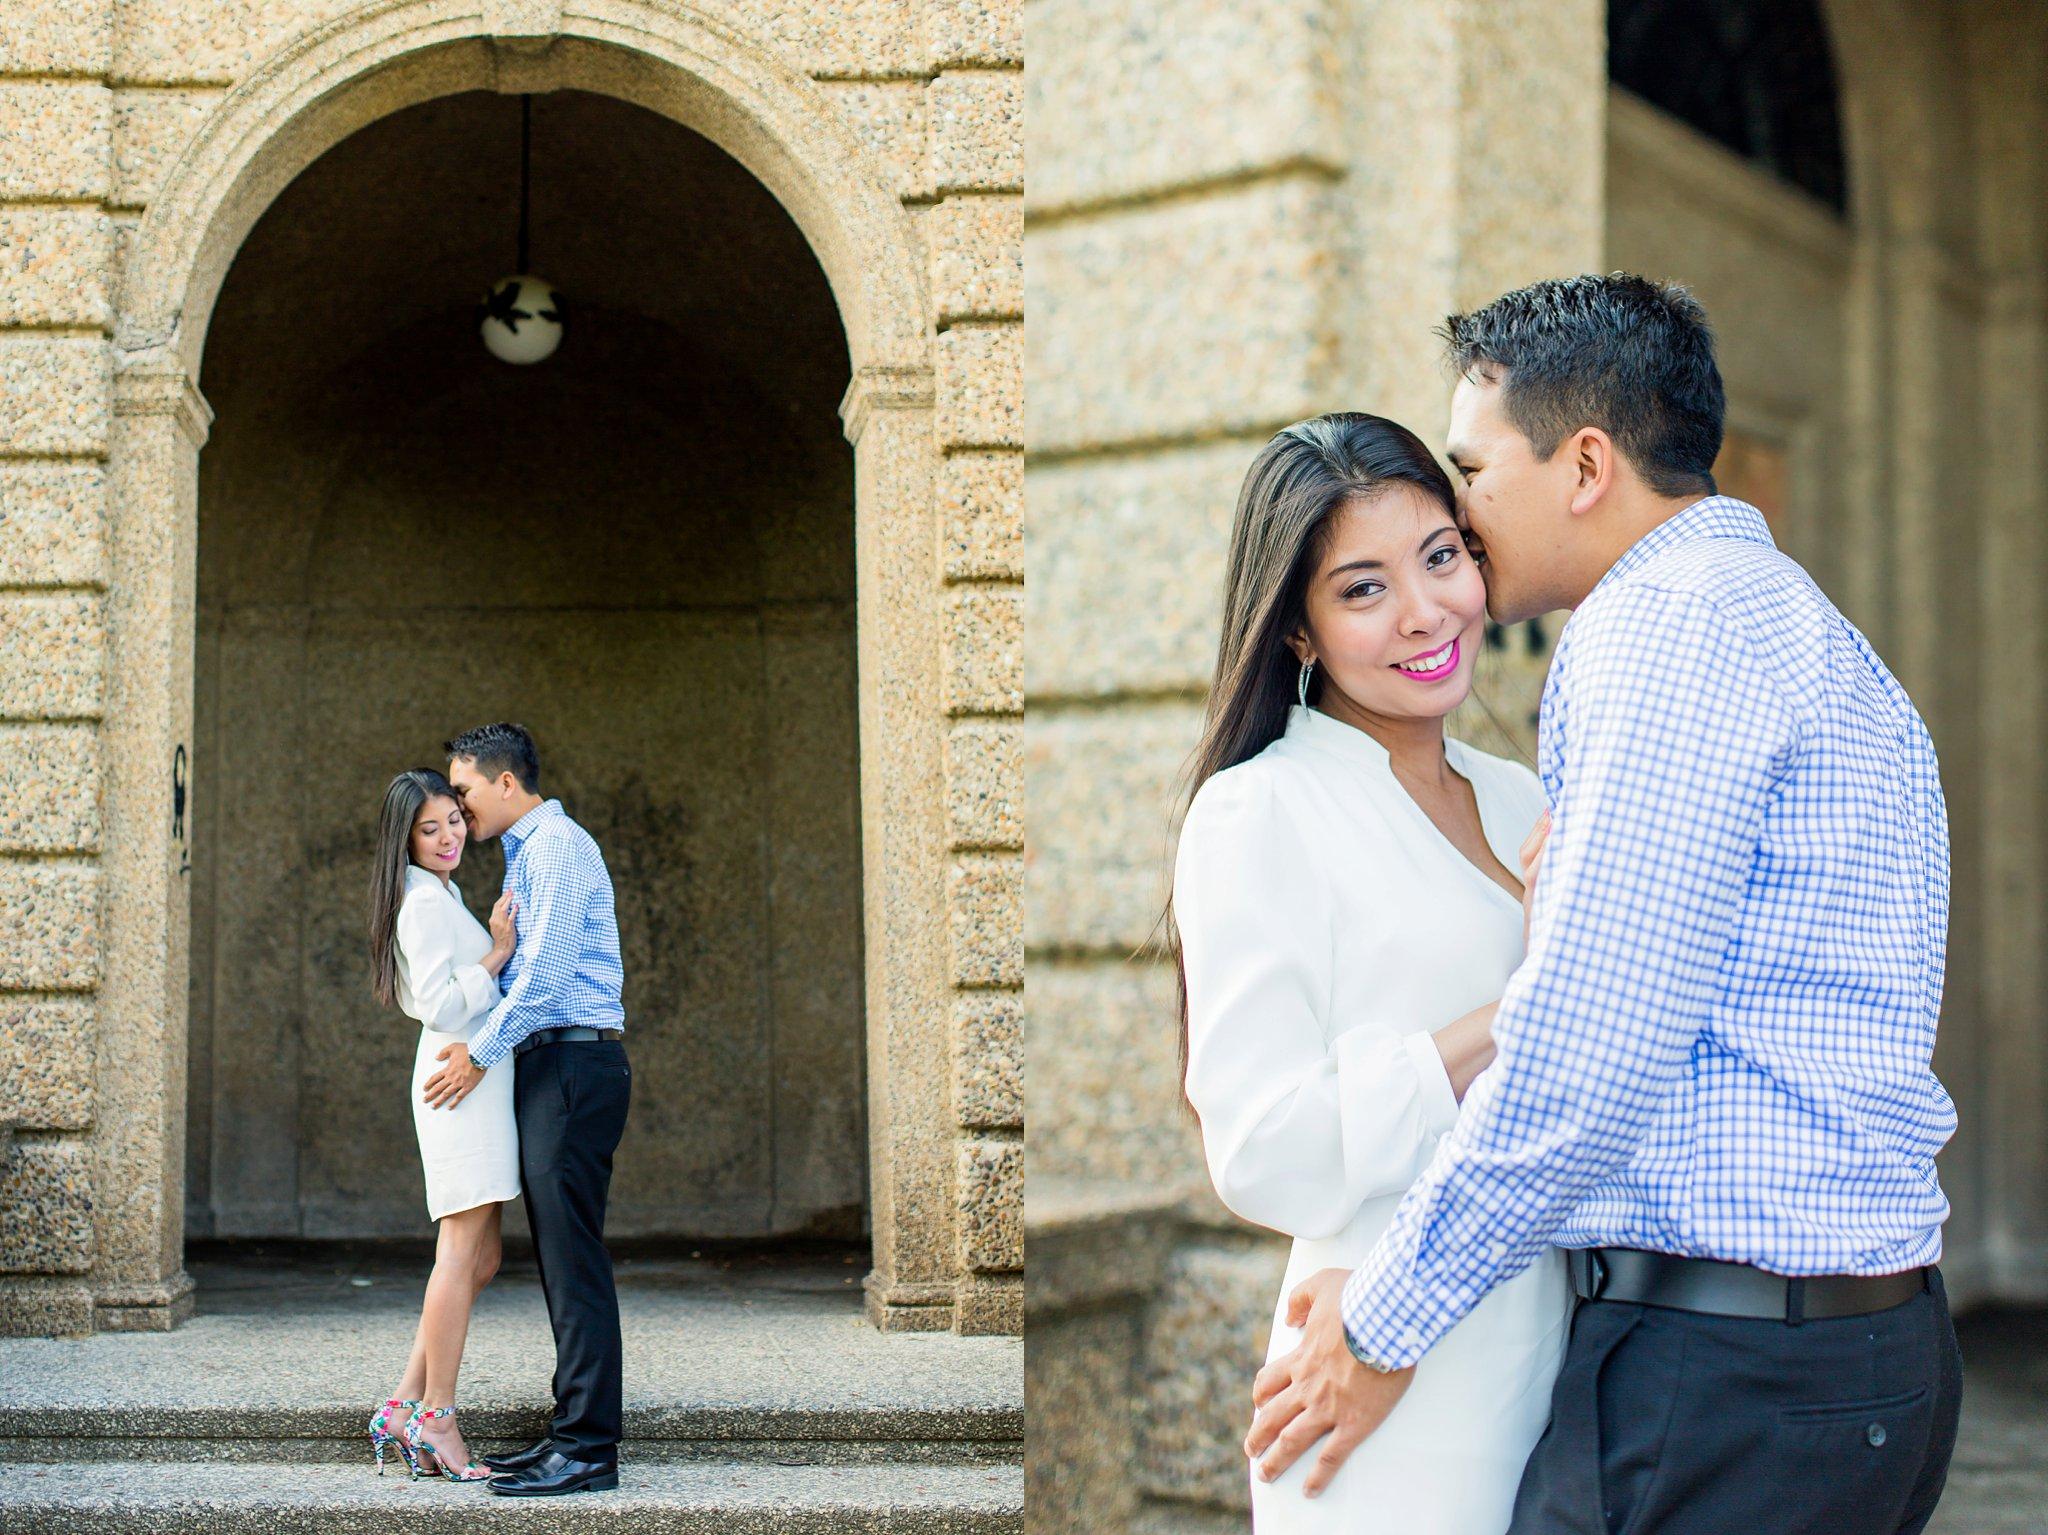 Thin & Phil Meridian Hill Park DC Engagement Photos-31.jpg